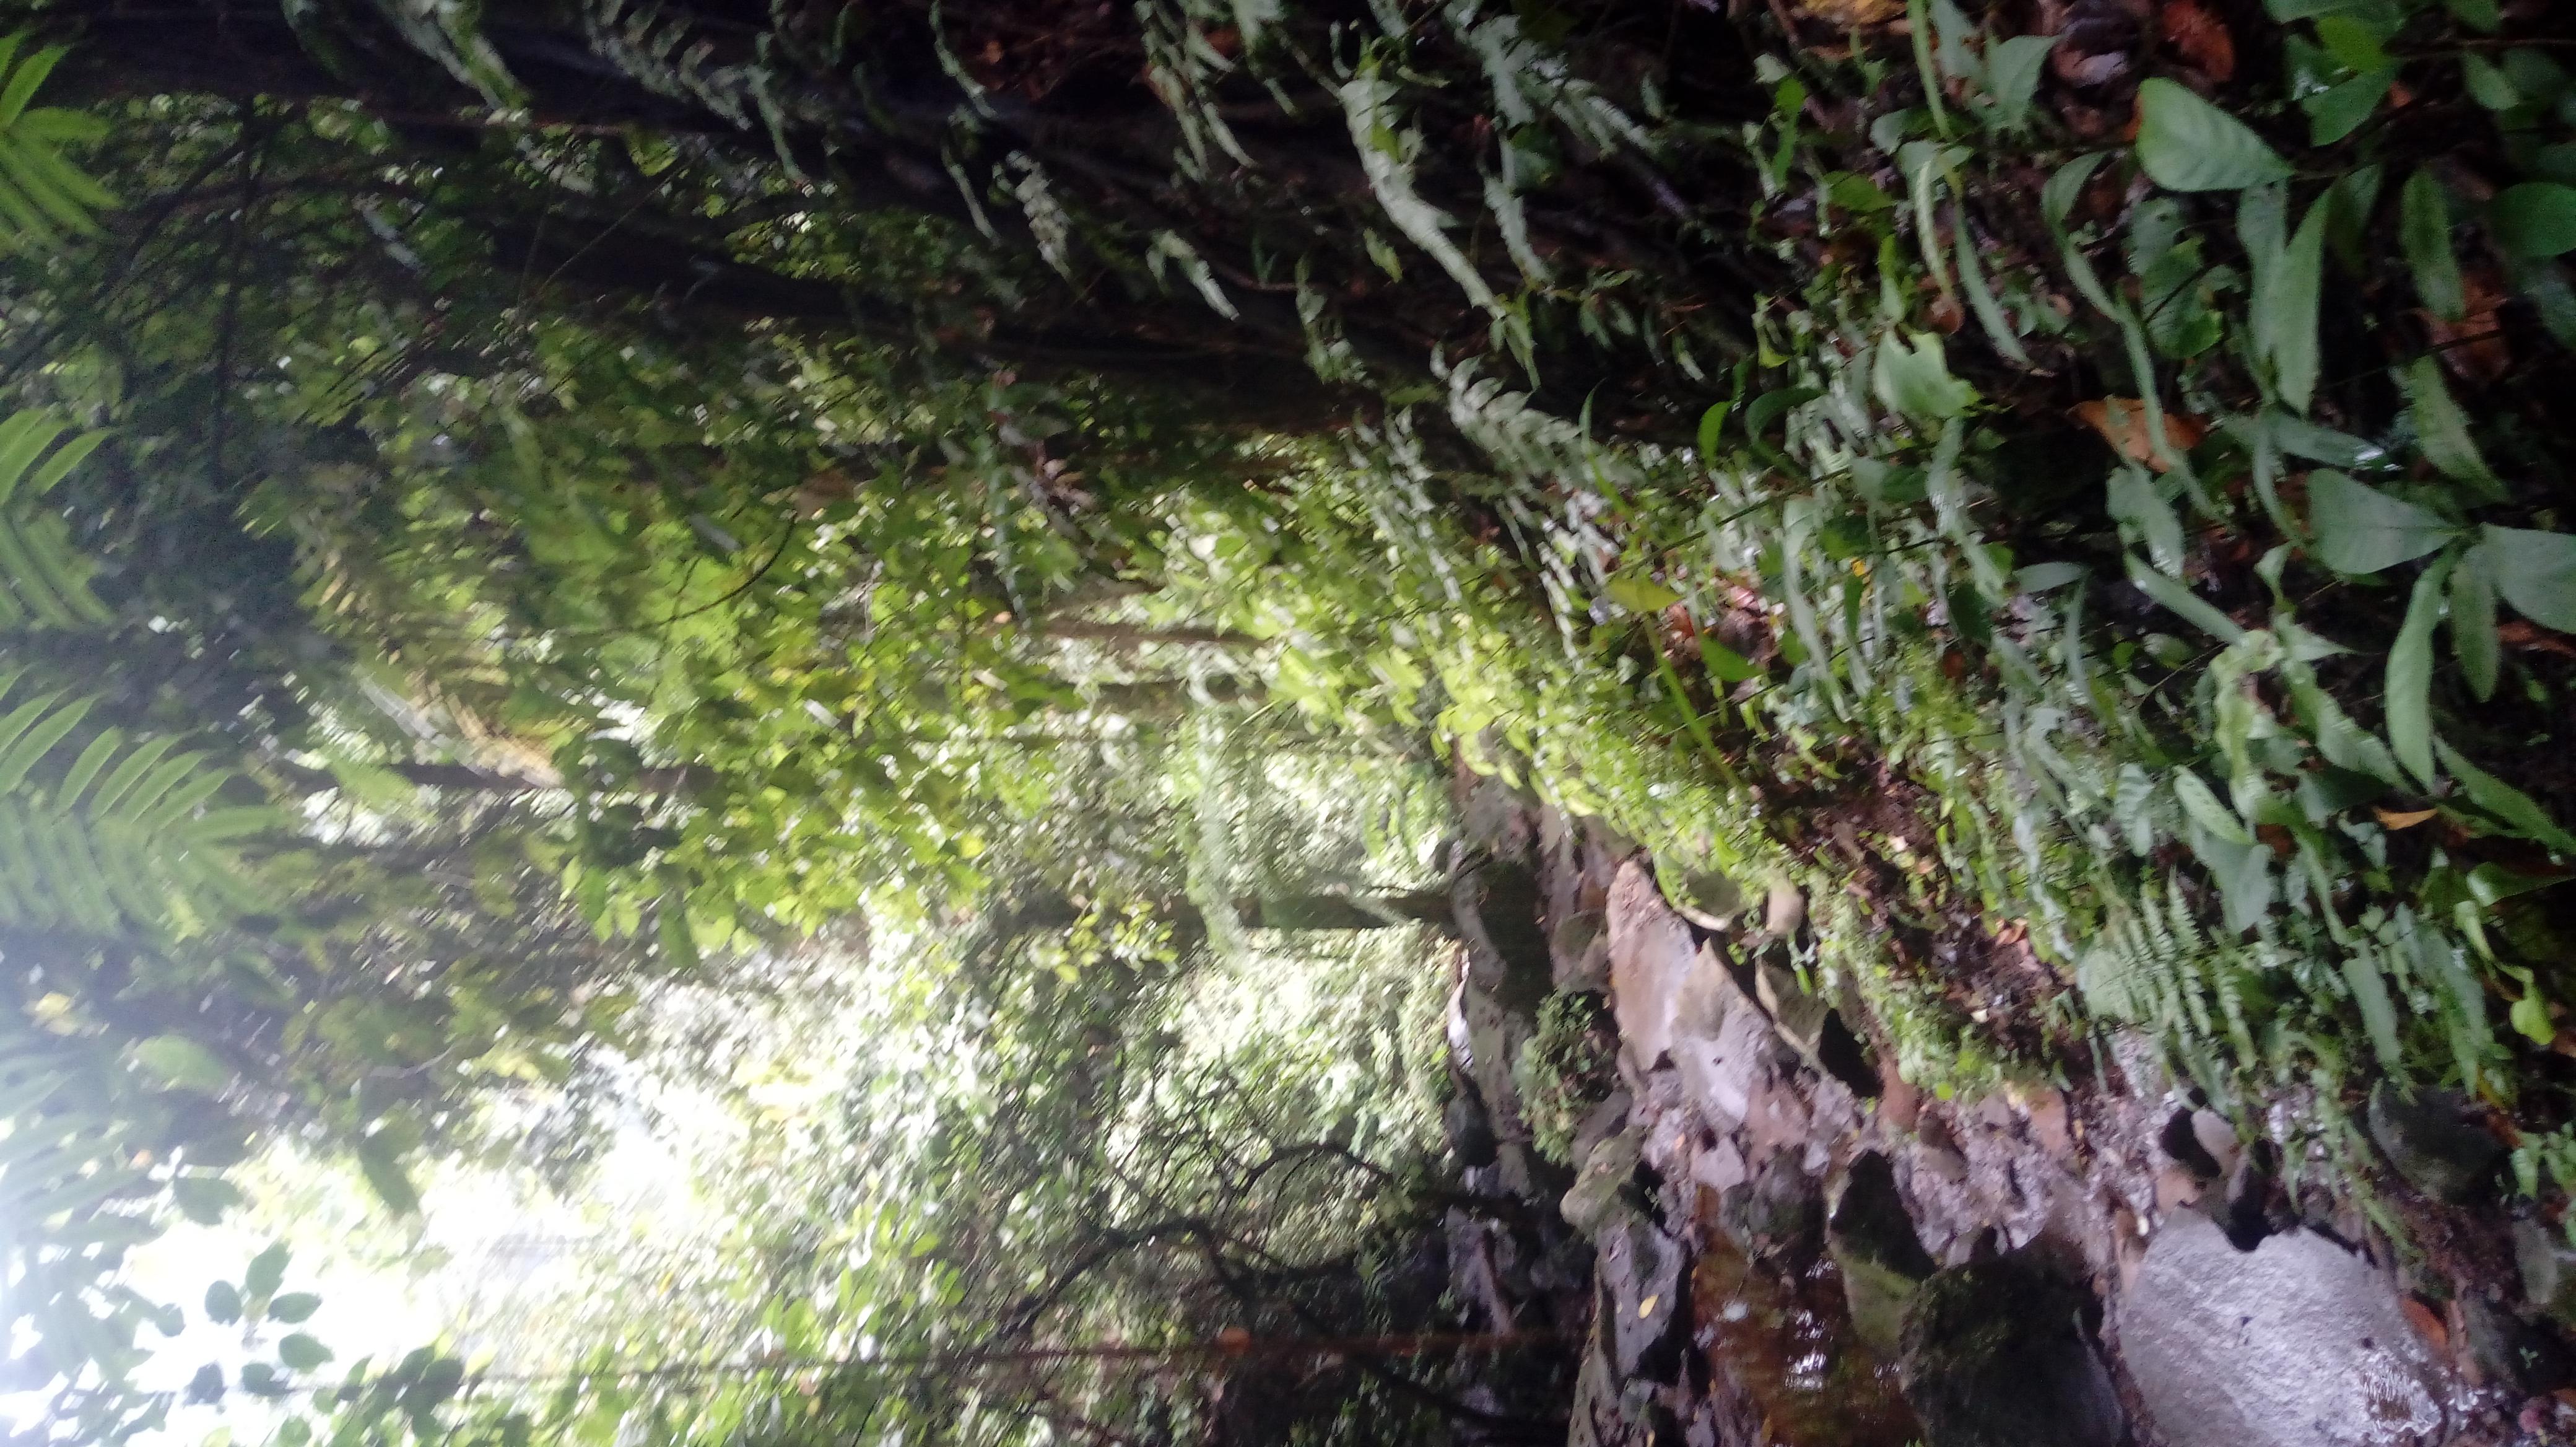 Berkas Pemandangan Alam Sekitar Curug Cikaracak Jpg Wikipedia Bahasa Indonesia Ensiklopedia Bebas